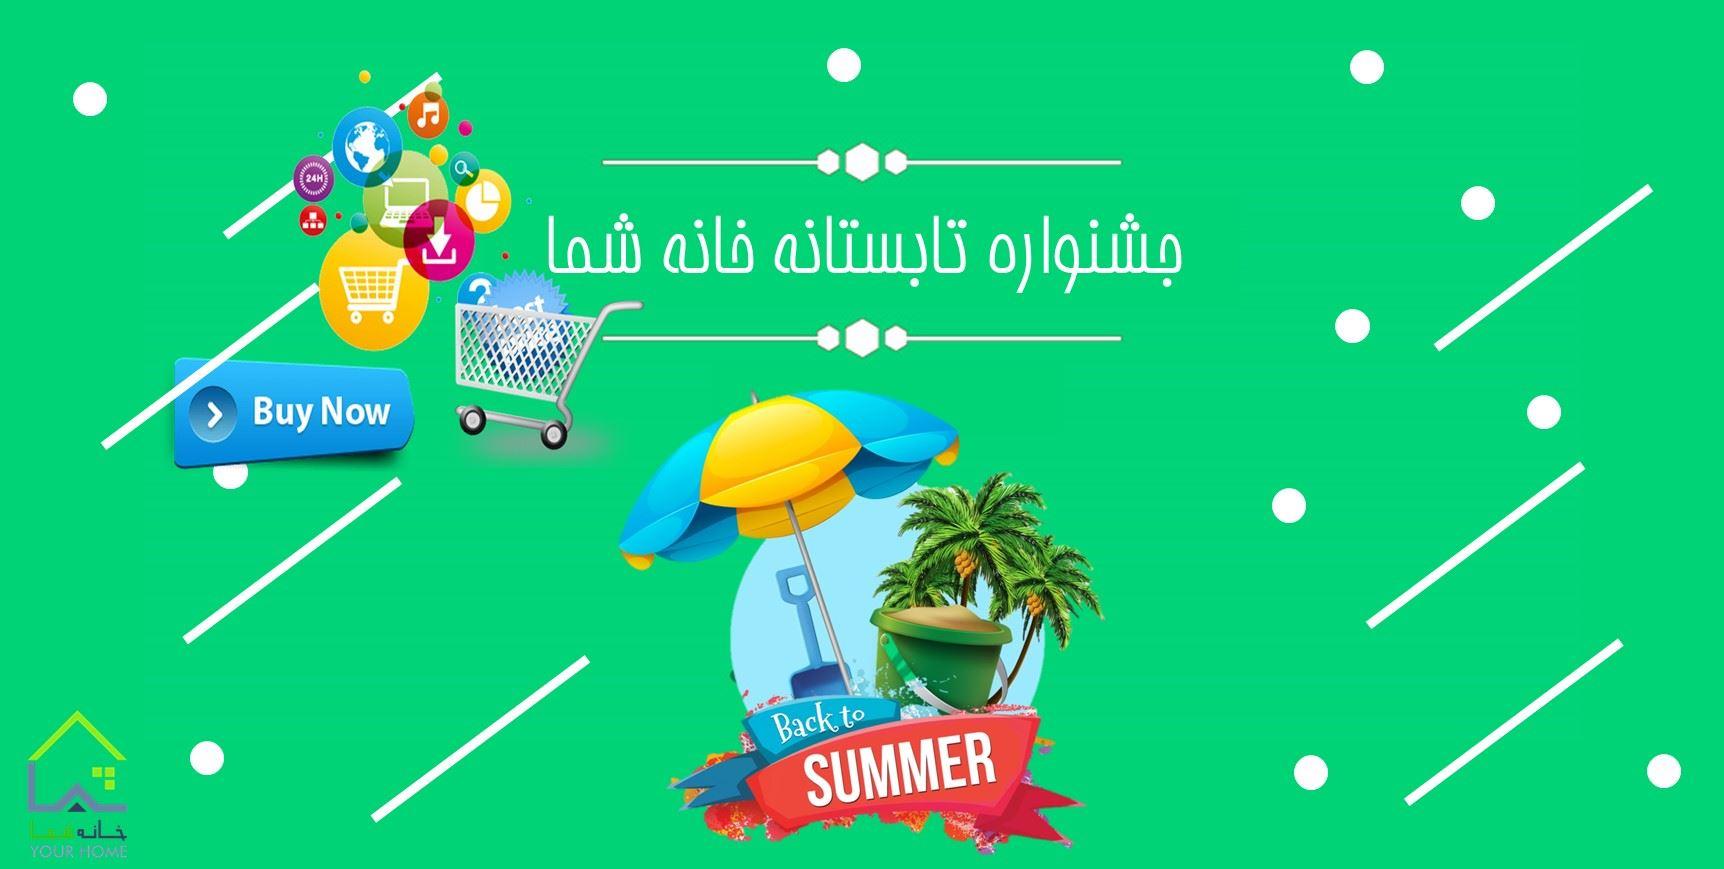 جشنواره تابستانه